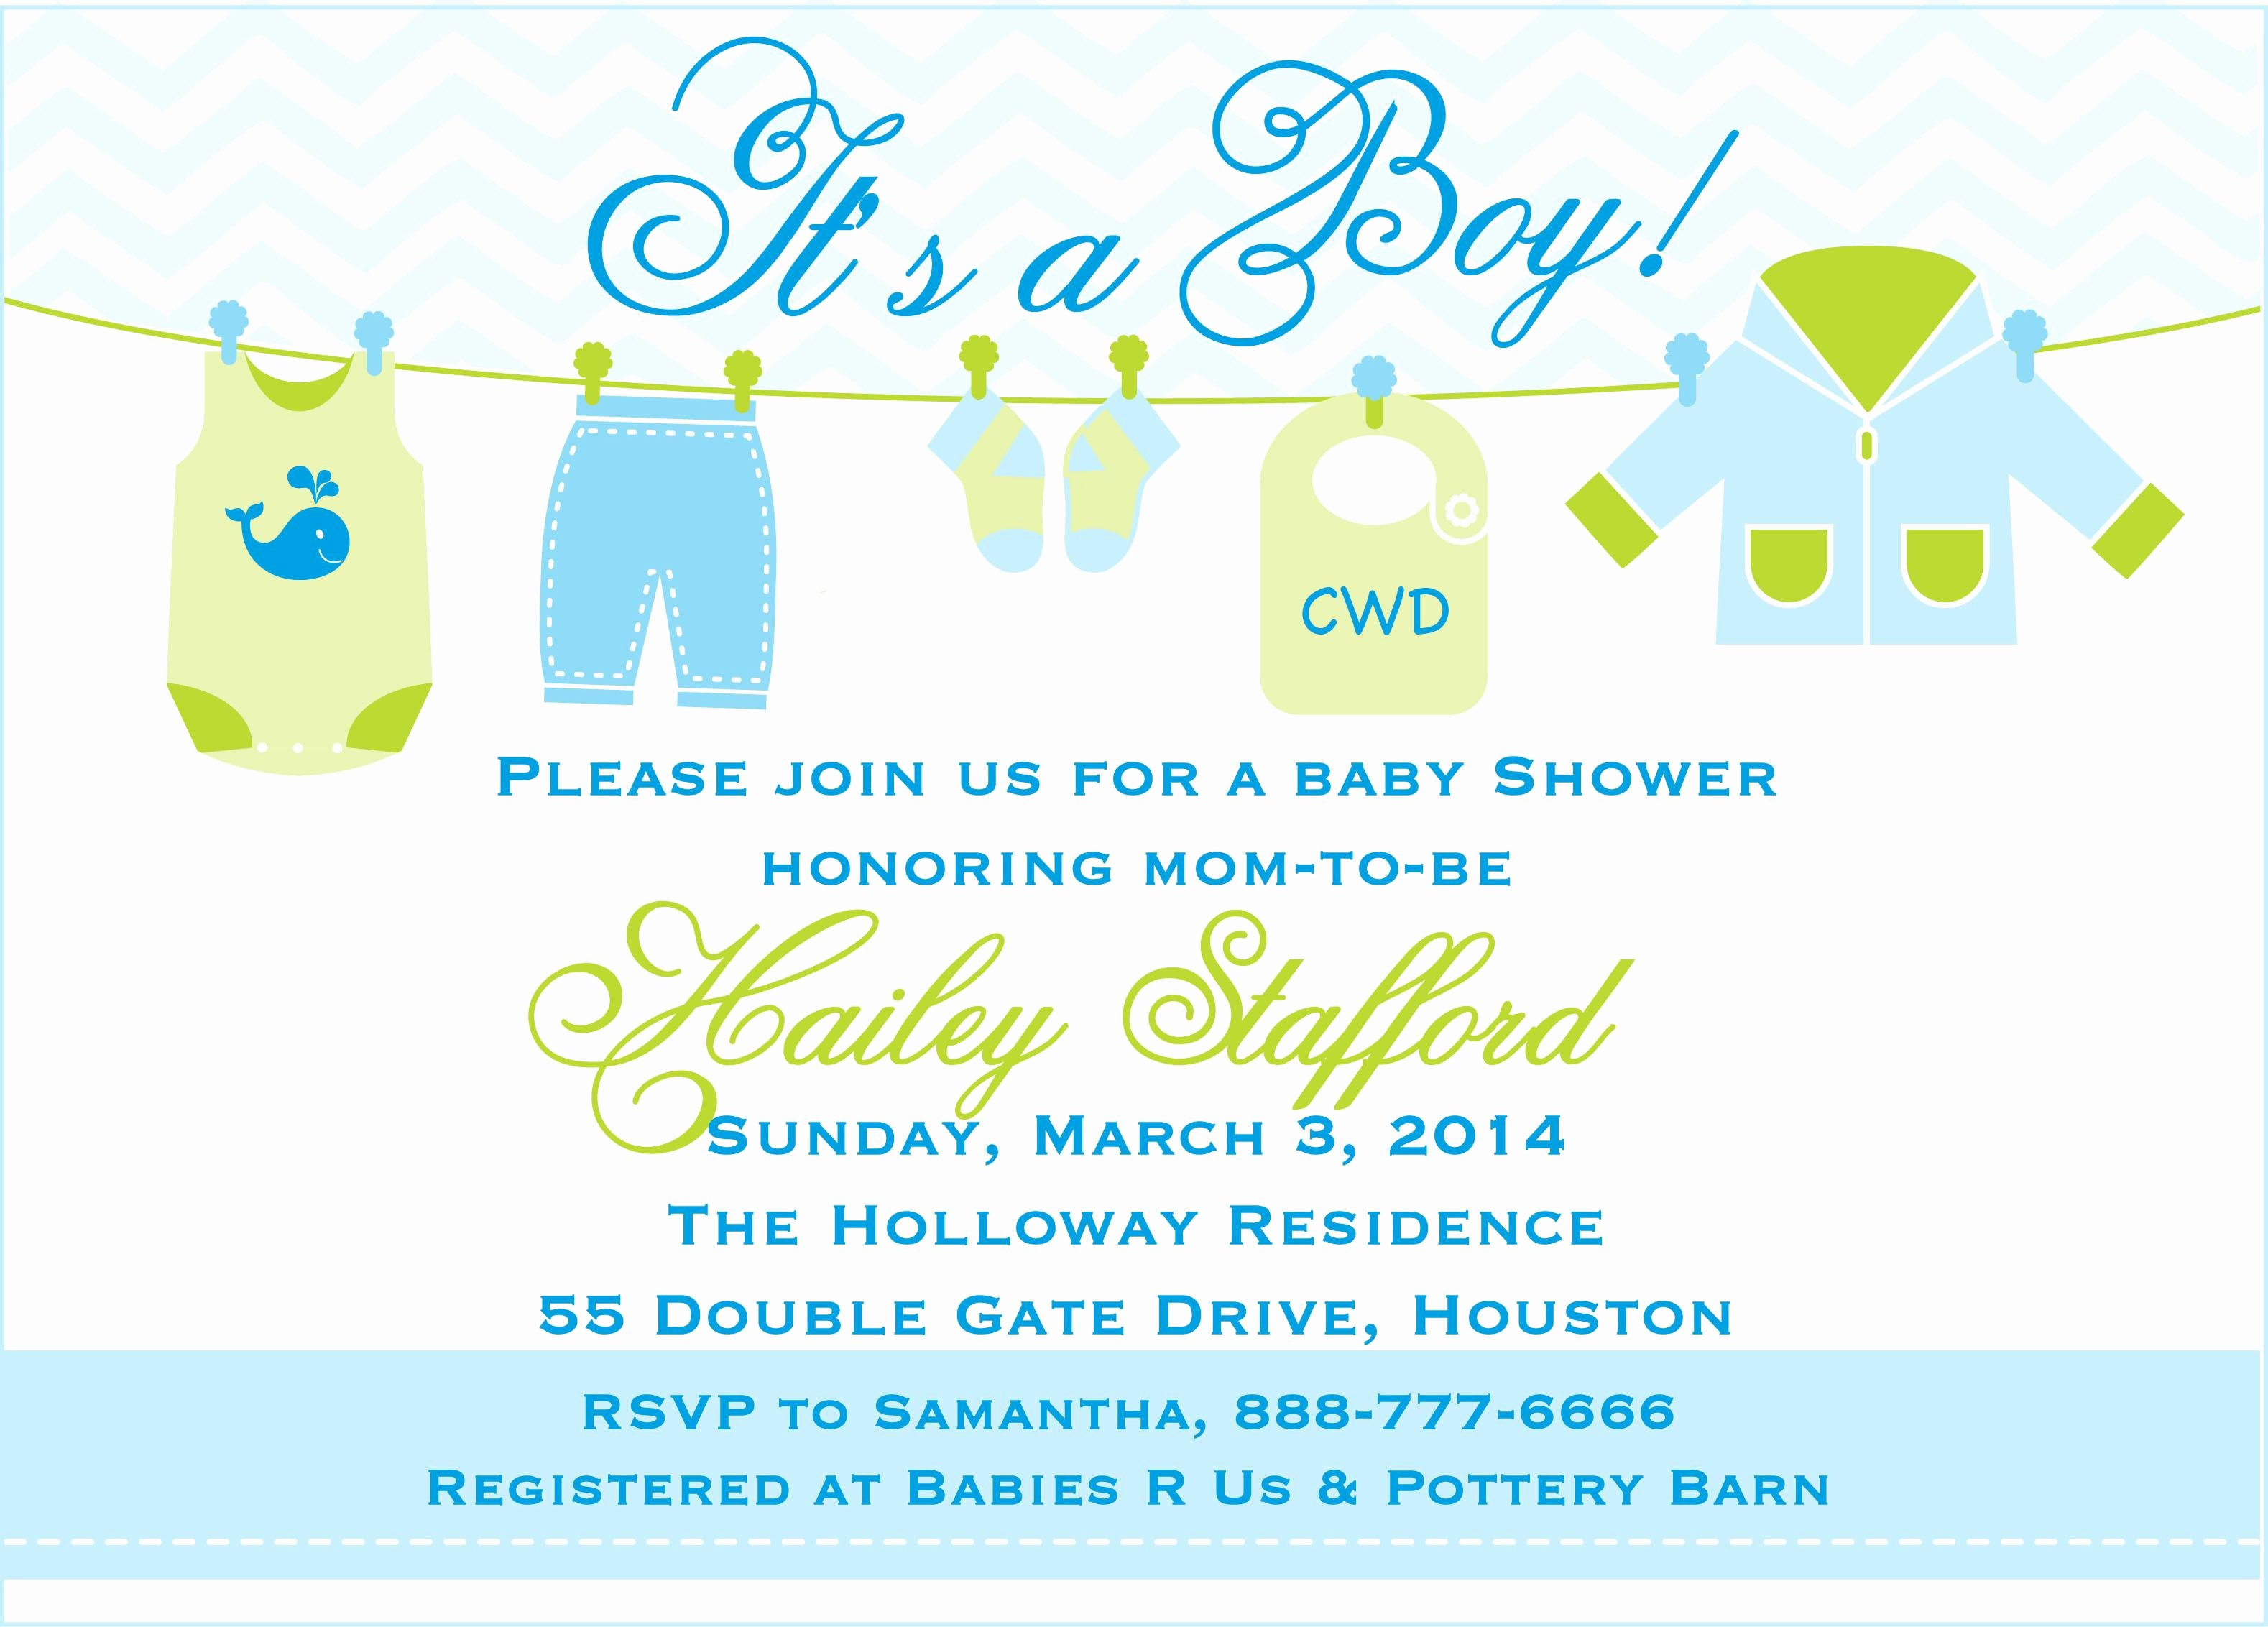 Baby Shower Invite Template Fresh Free Printable Baby Shower Invitations Templates for Boys